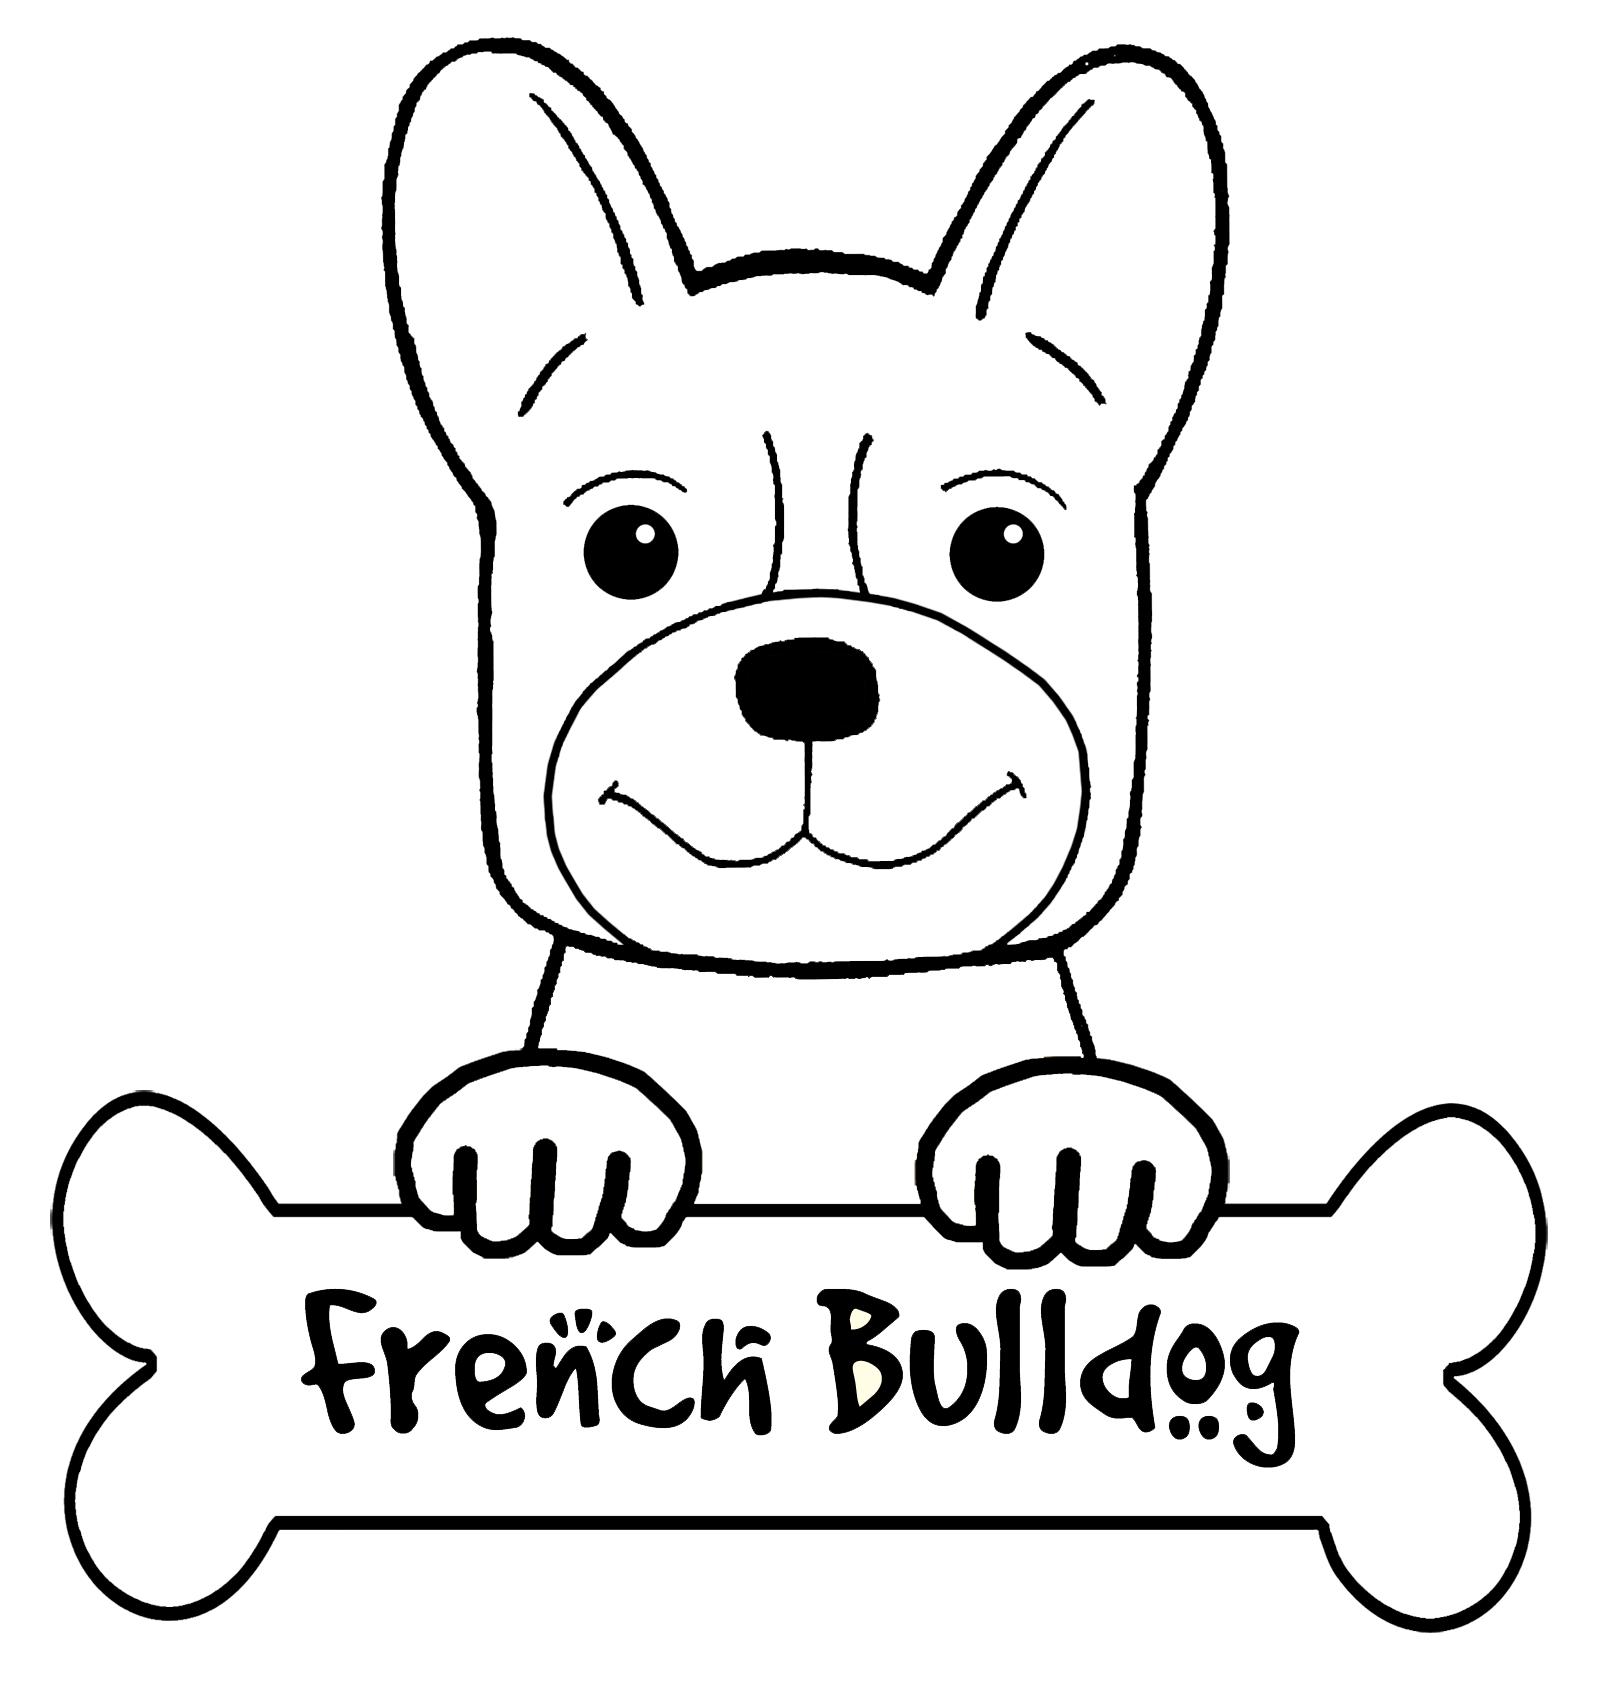 french bulldog coloring pages french bulldog coloring page coloring sky pages french coloring bulldog